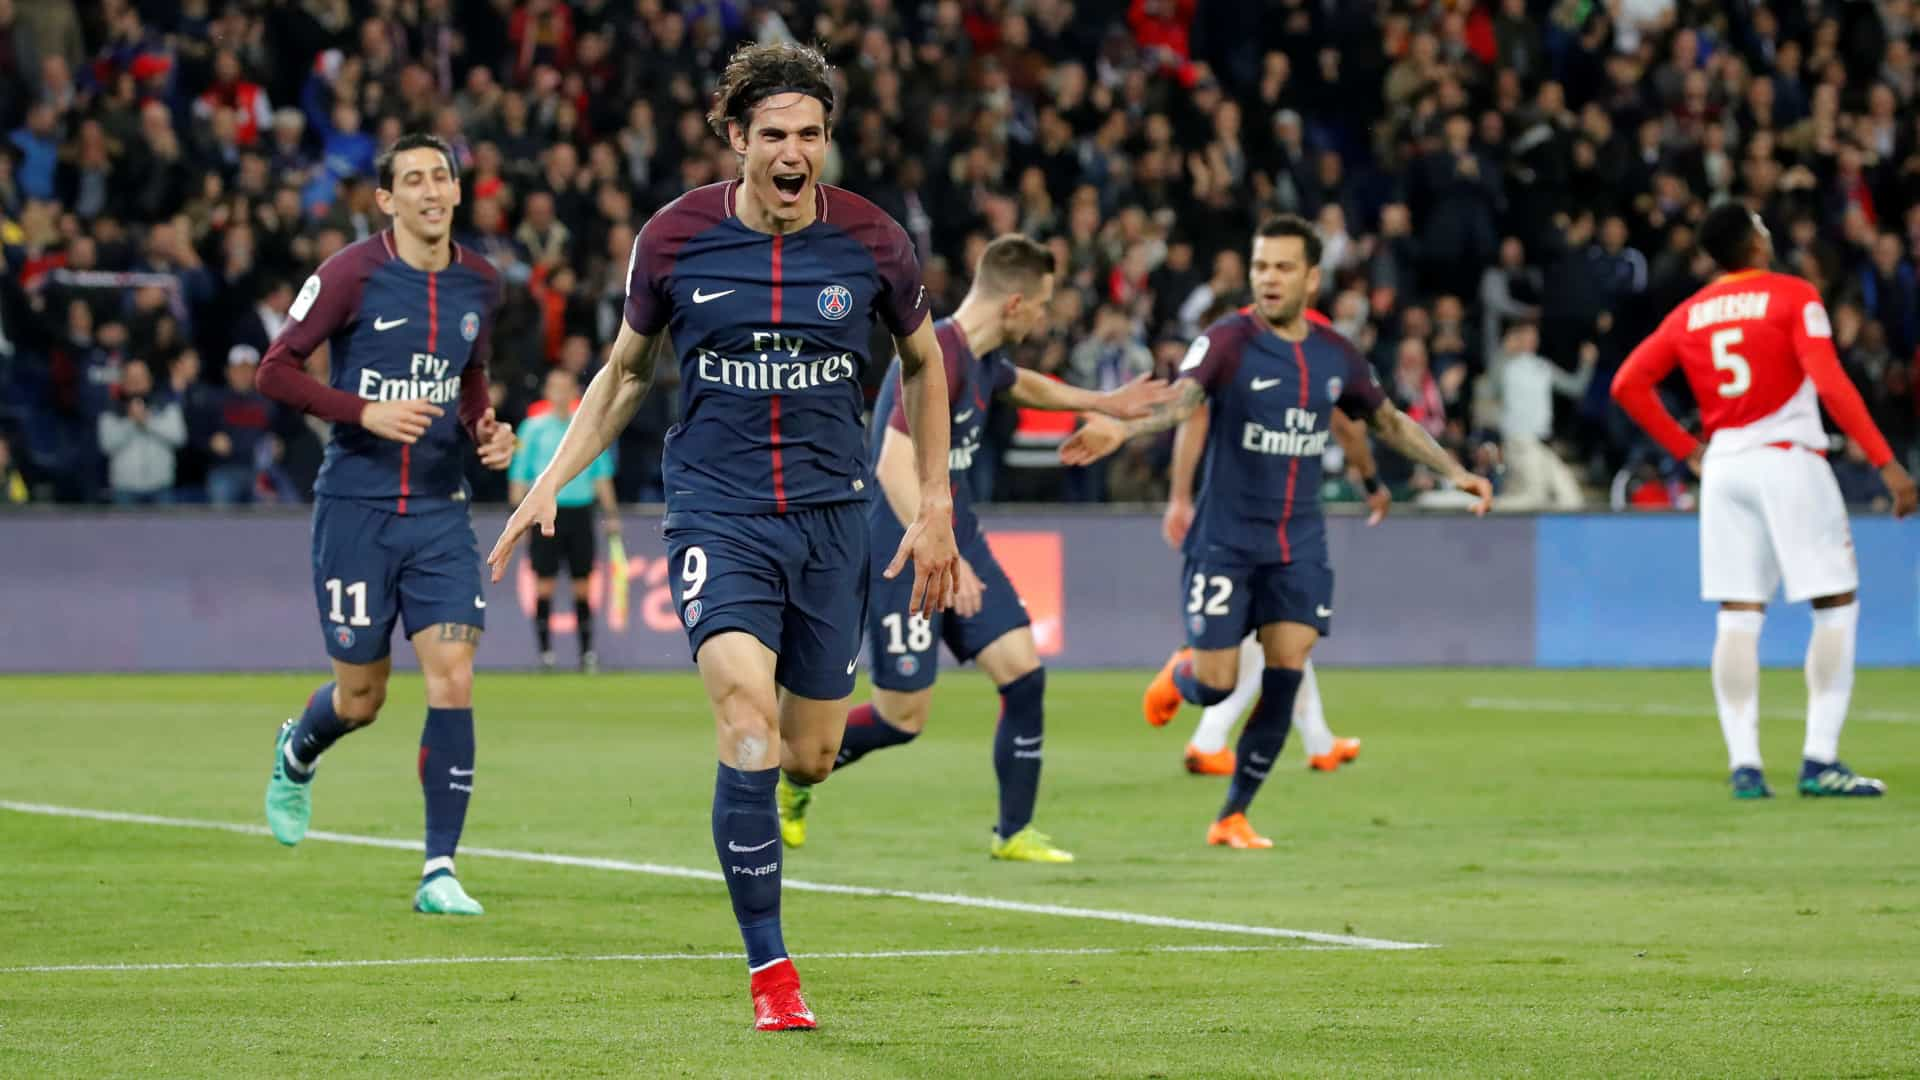 Assista aos gols da partida — PSG x Monaco